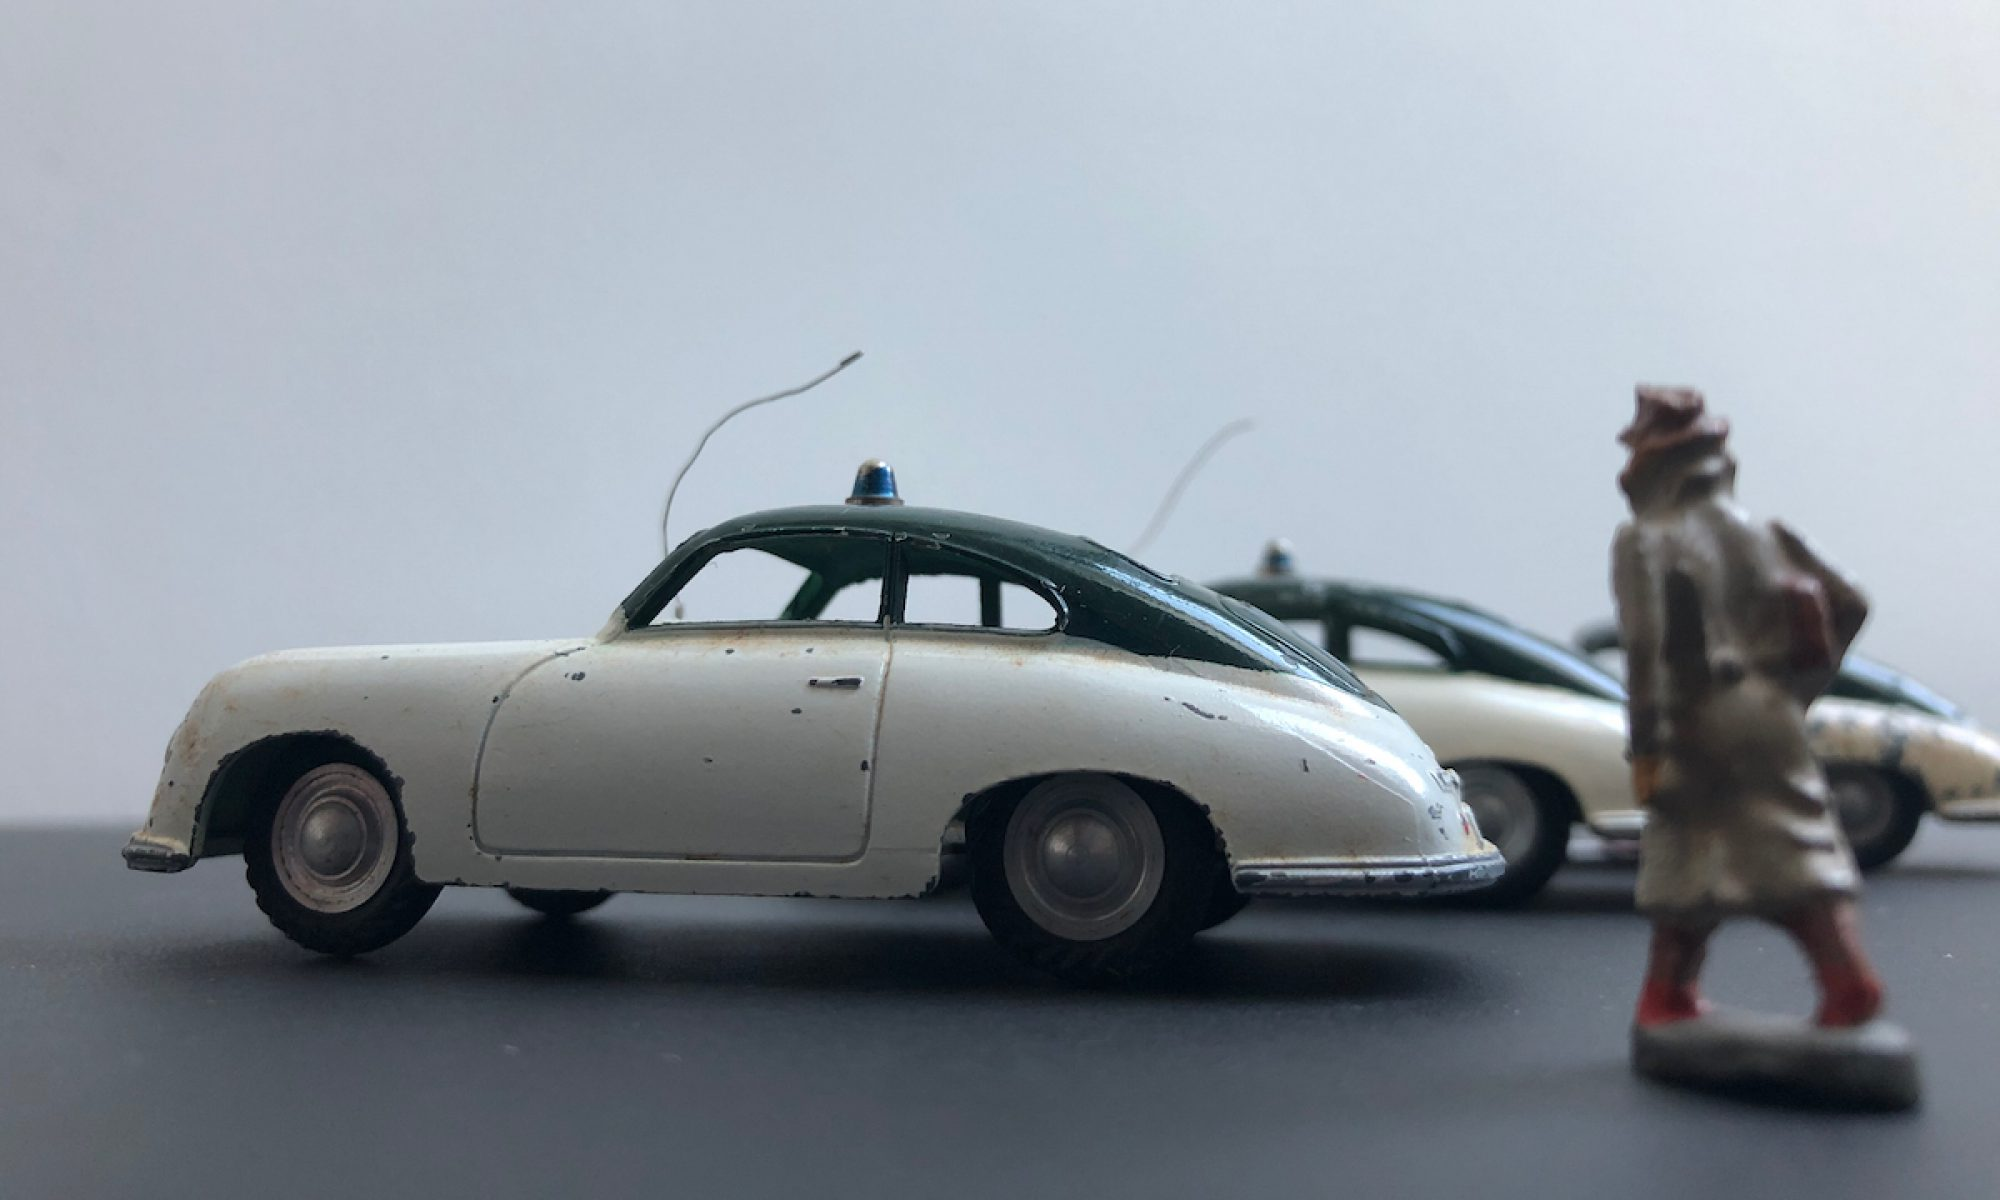 miniatur-tischbahn.de